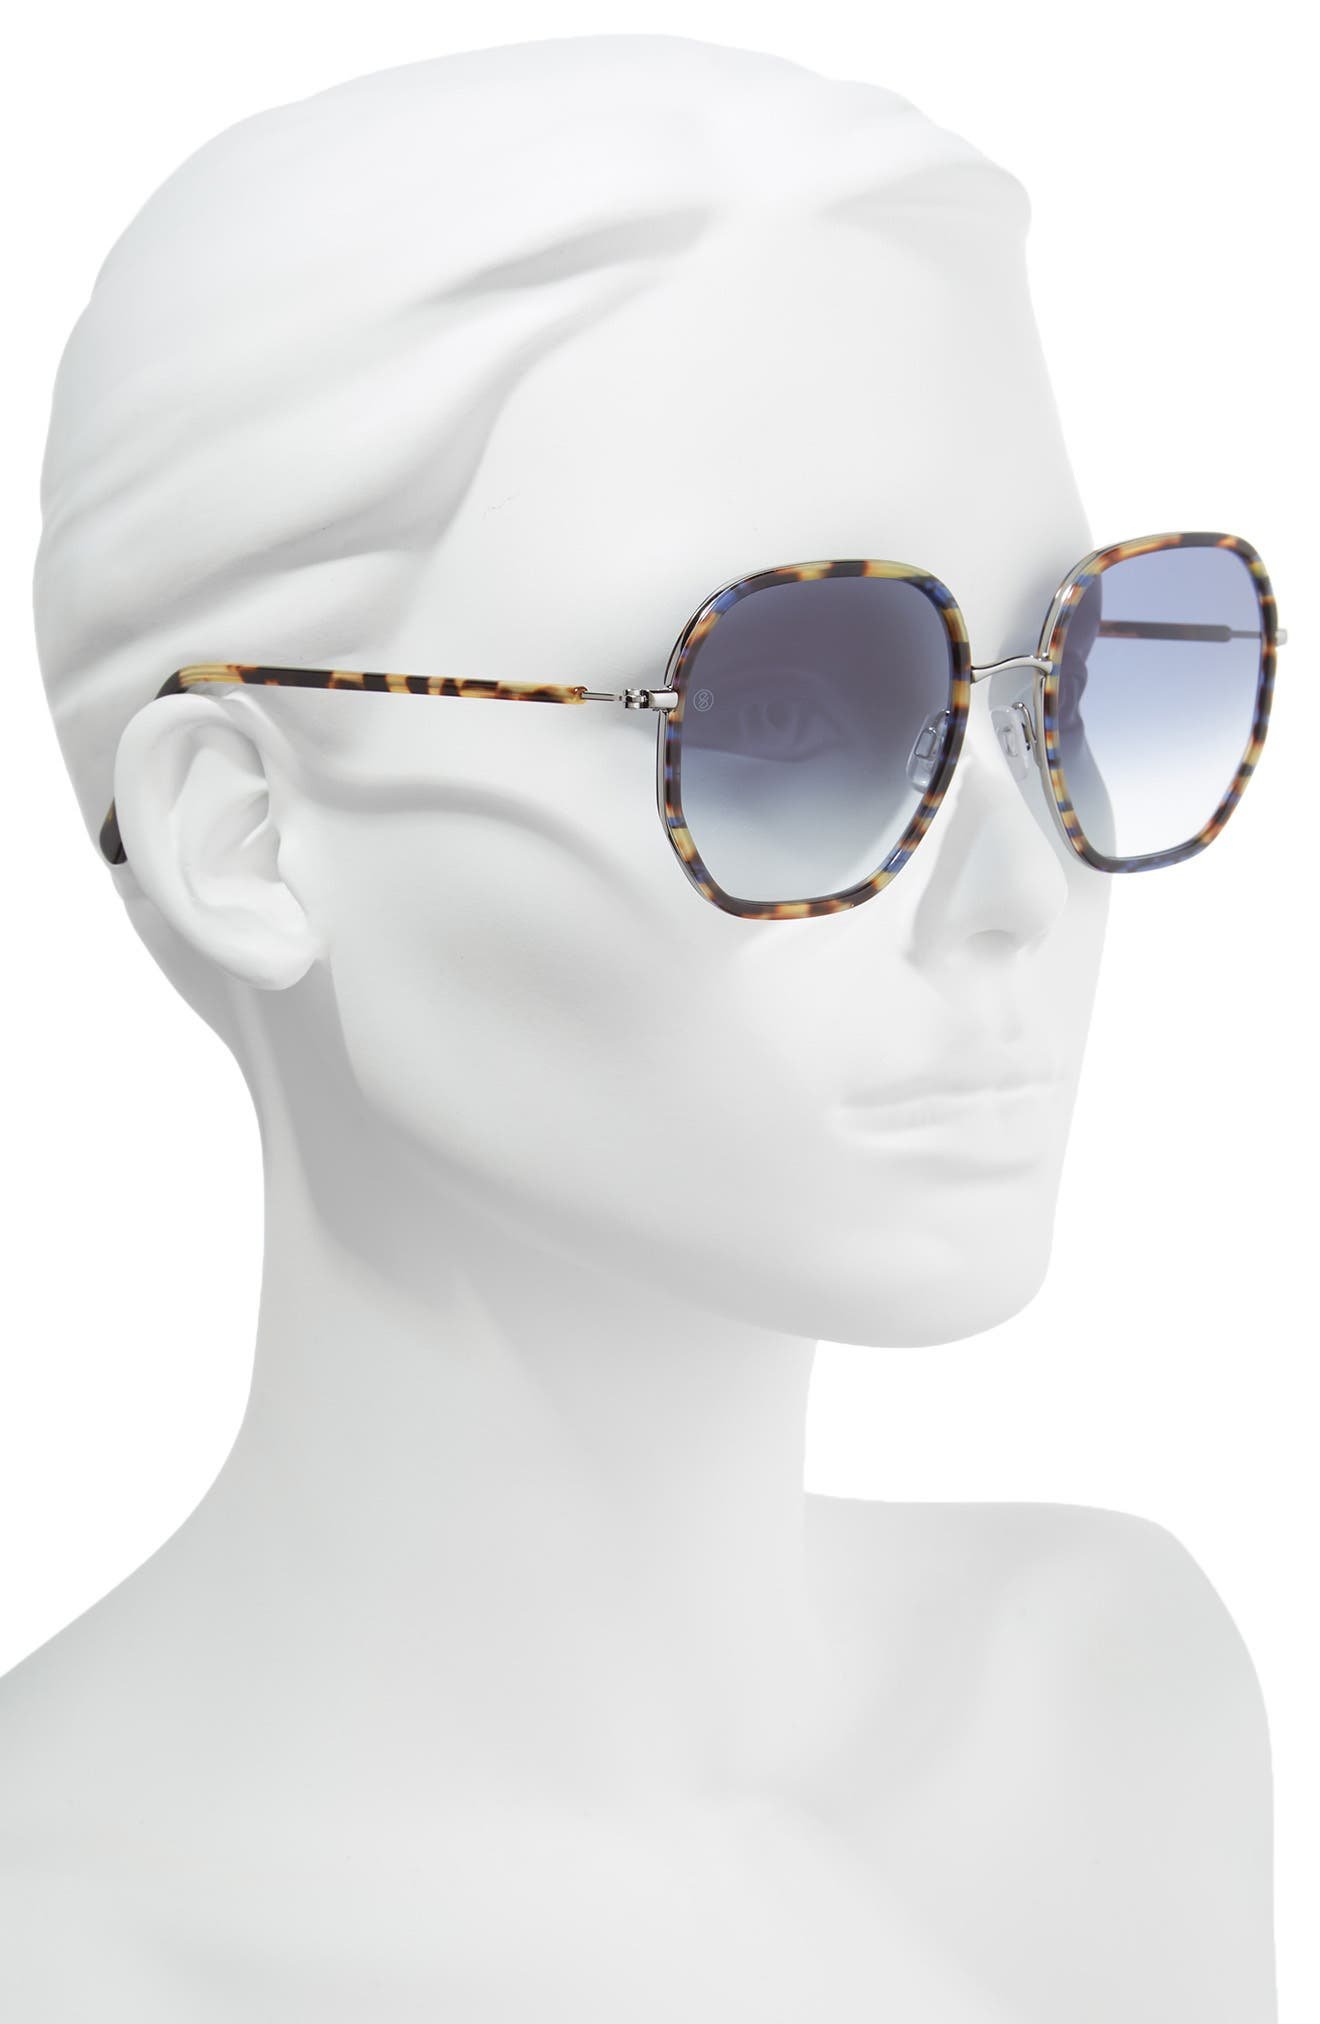 D'BLANC Rare Fortune 59mm Sunglasses,                             Alternate thumbnail 2, color,                             INDIGO TORTOISE